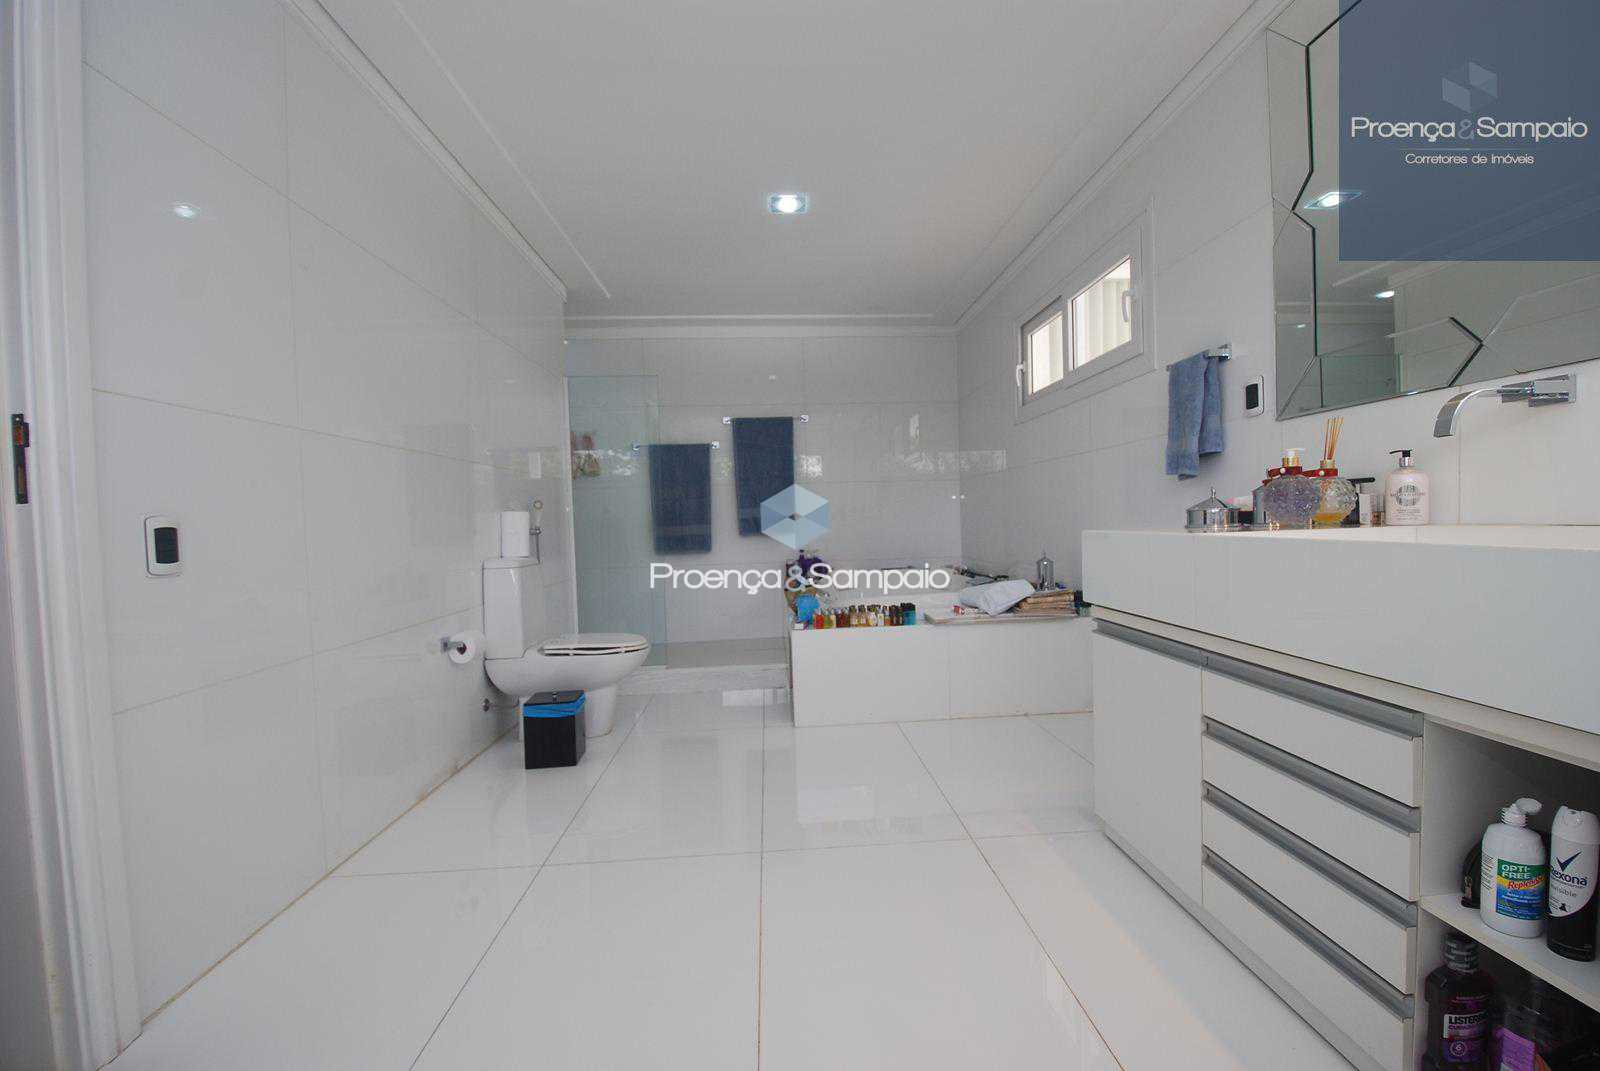 FOTO28 - Casa em Condomínio à venda Avenida Santos Dumont,Lauro de Freitas,BA - R$ 7.000.000 - PSCN50005 - 30